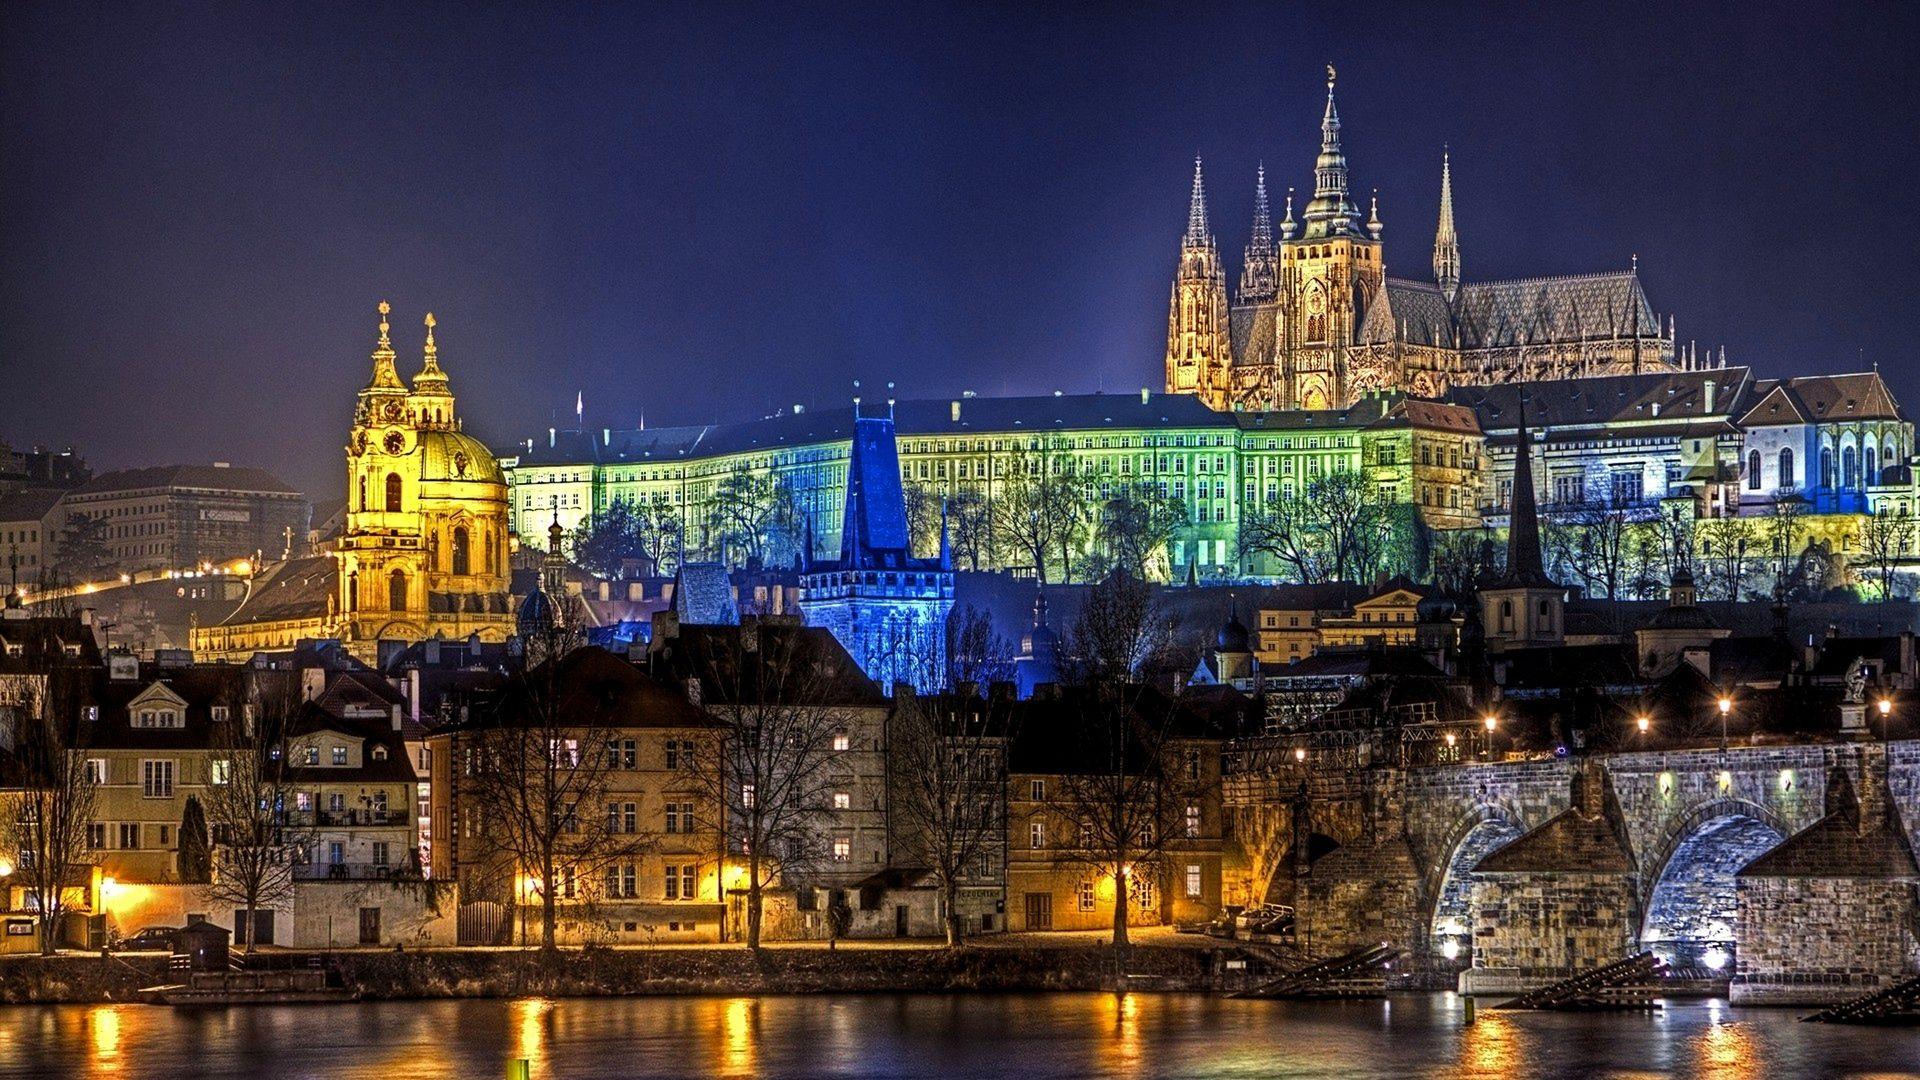 Europe download free wallpaper image search